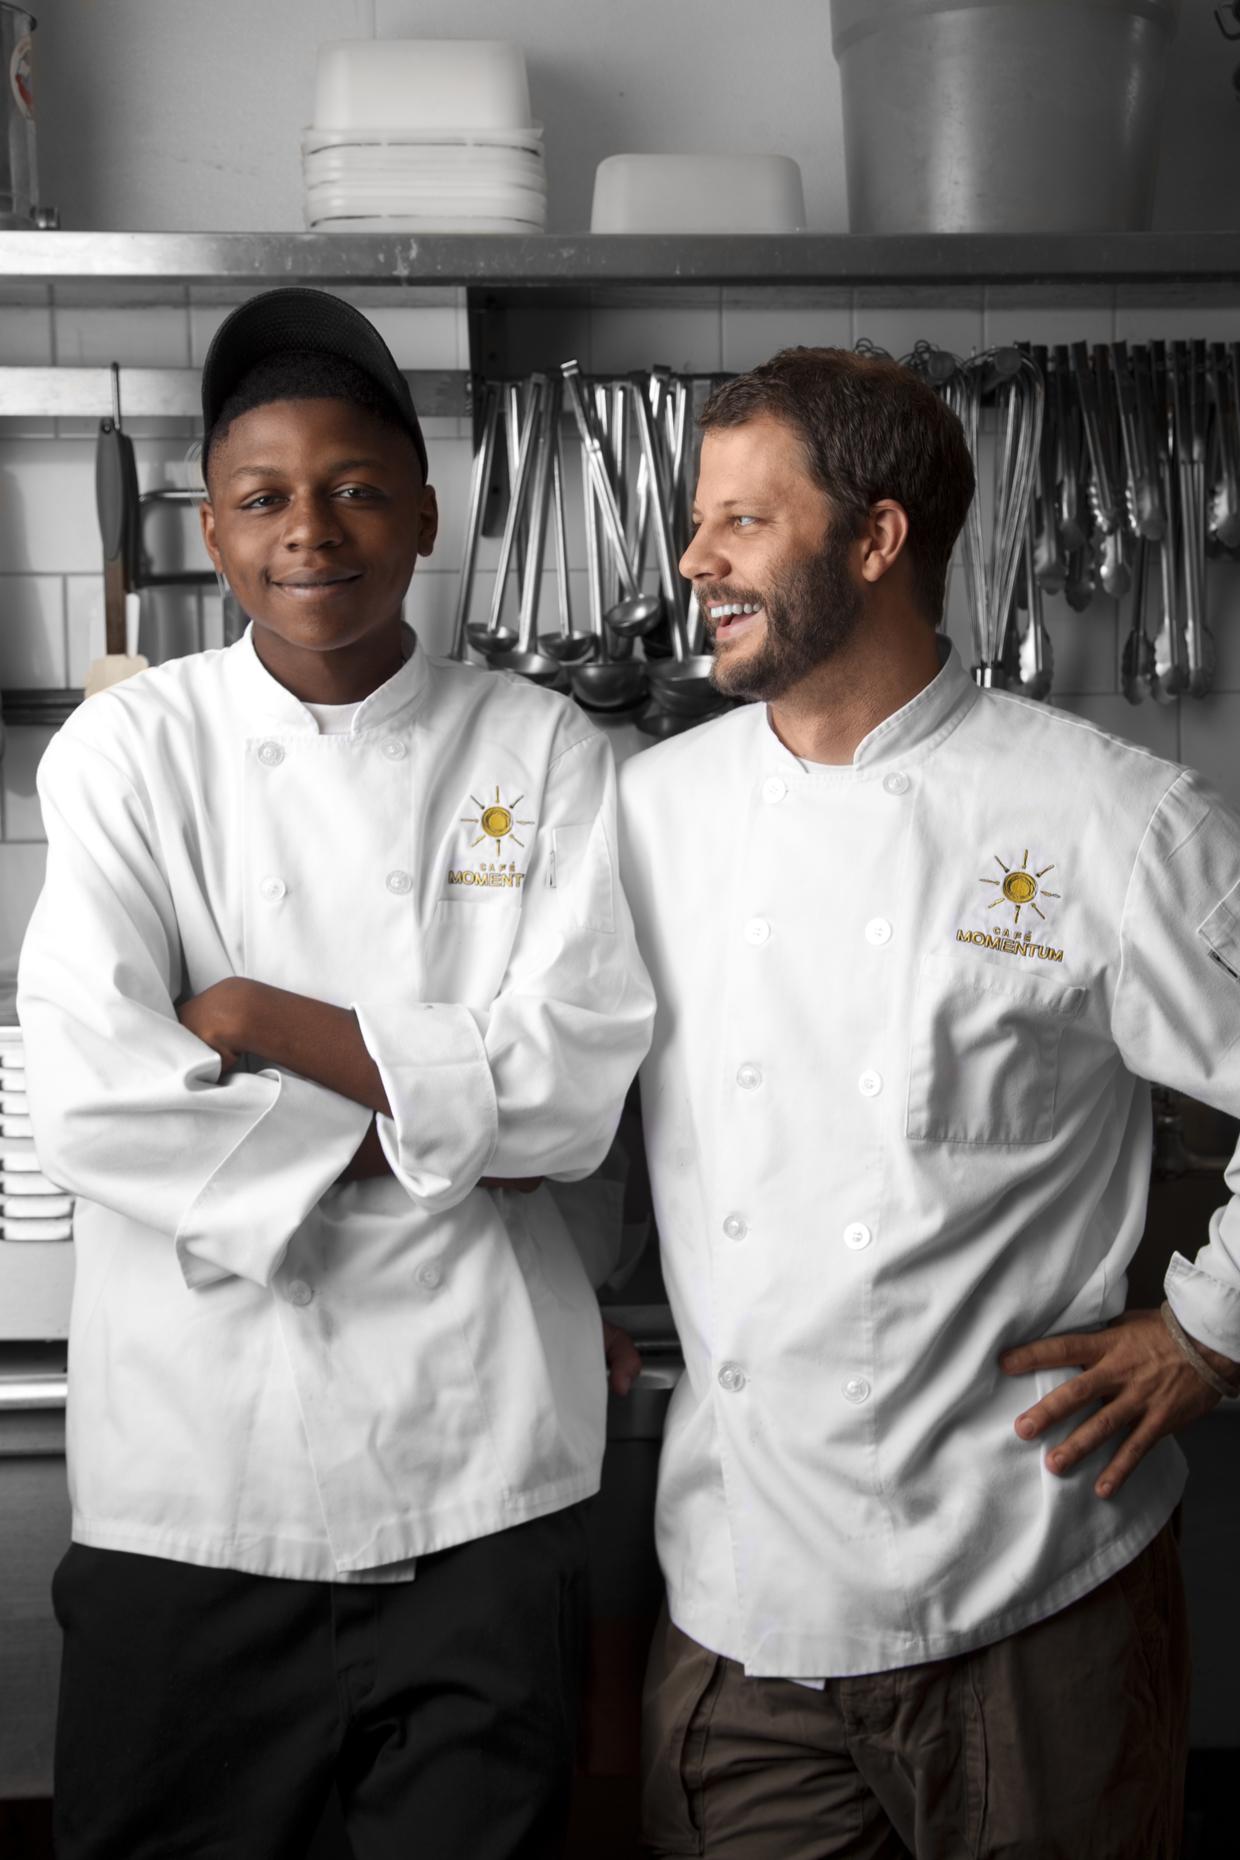 Chef Chad Houser and Malik Runnels,Credit Stanton Stephens